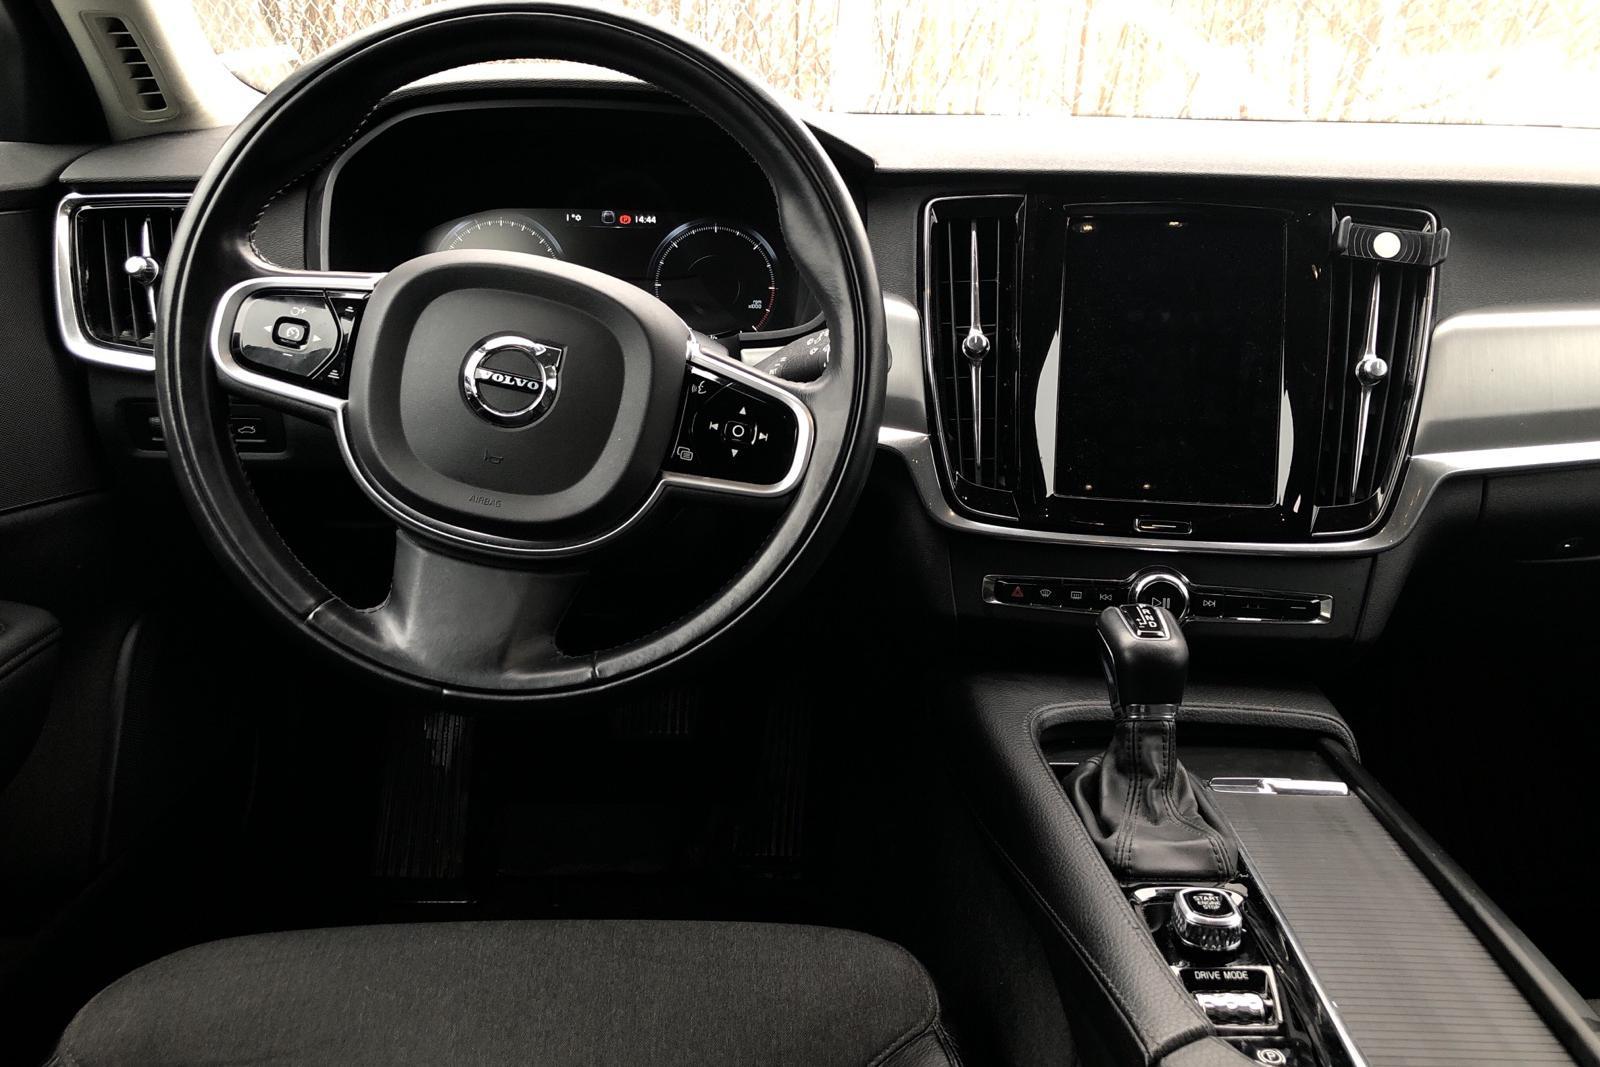 Volvo V90 D4 Cross Country AWD (190hk) - 5 928 mil - Automat - svart - 2018